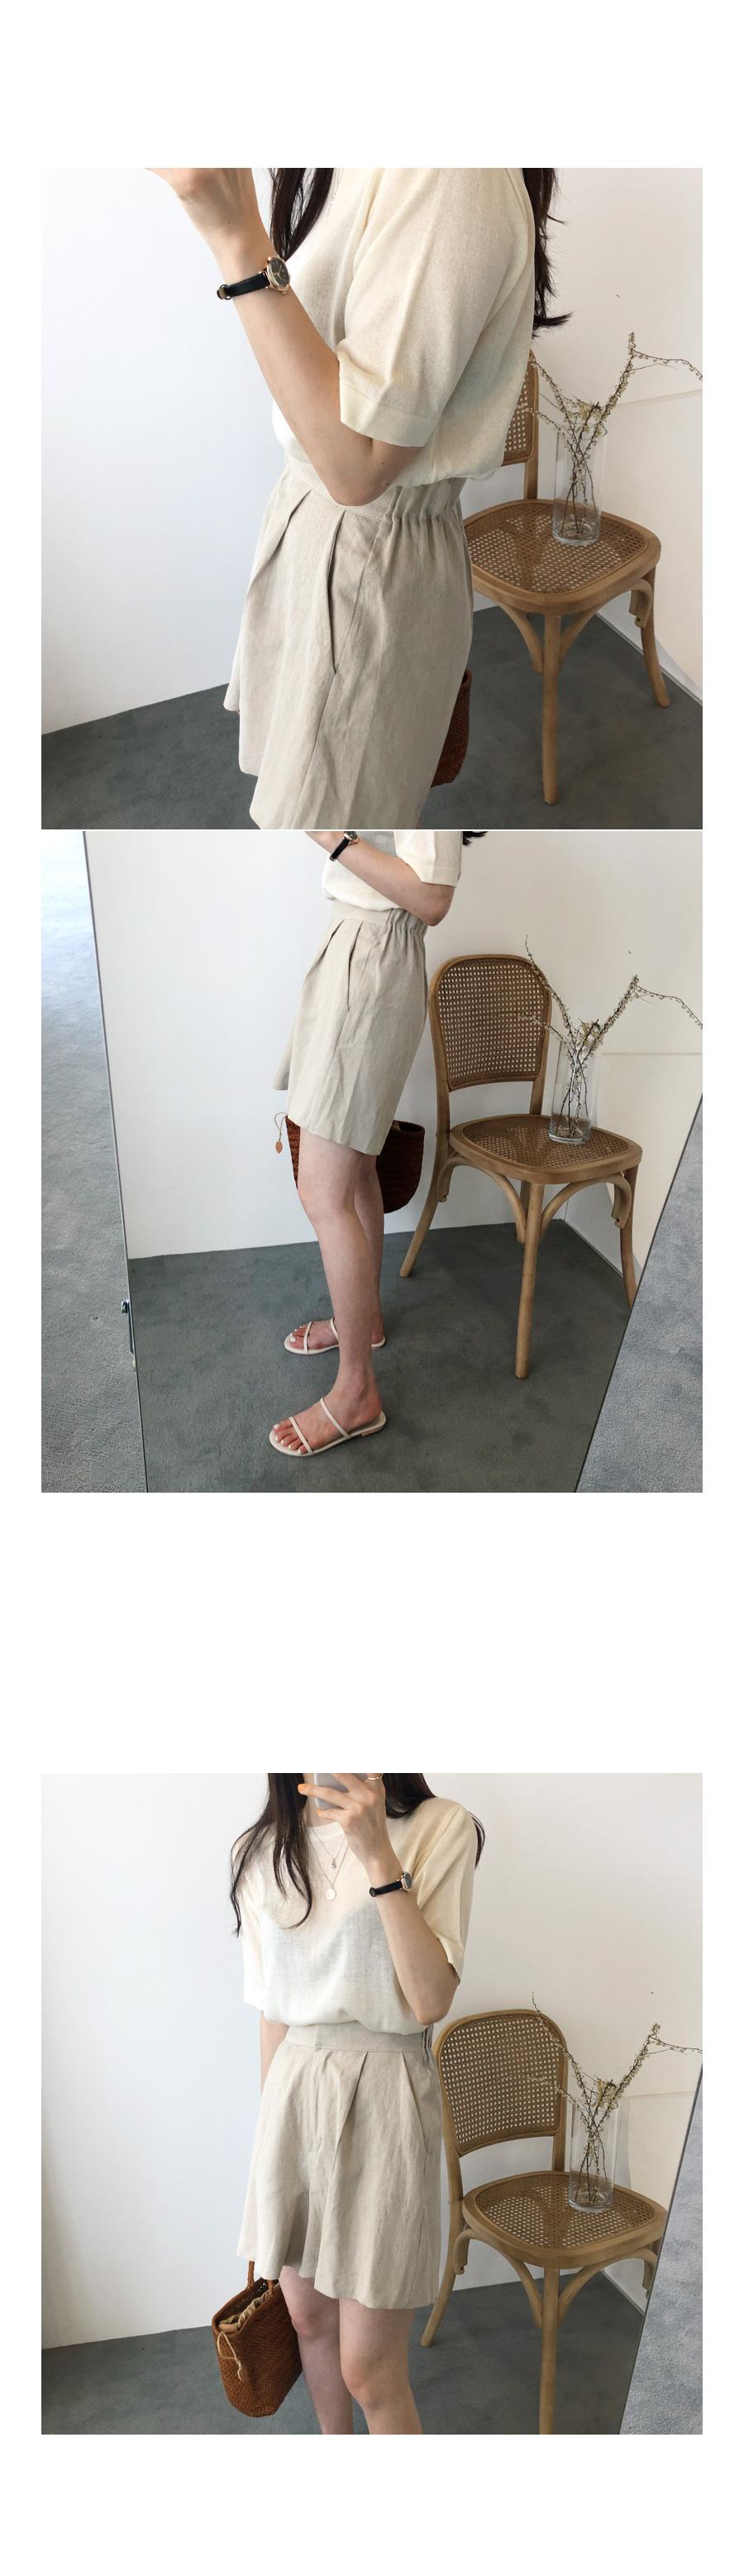 Logian knit cream black